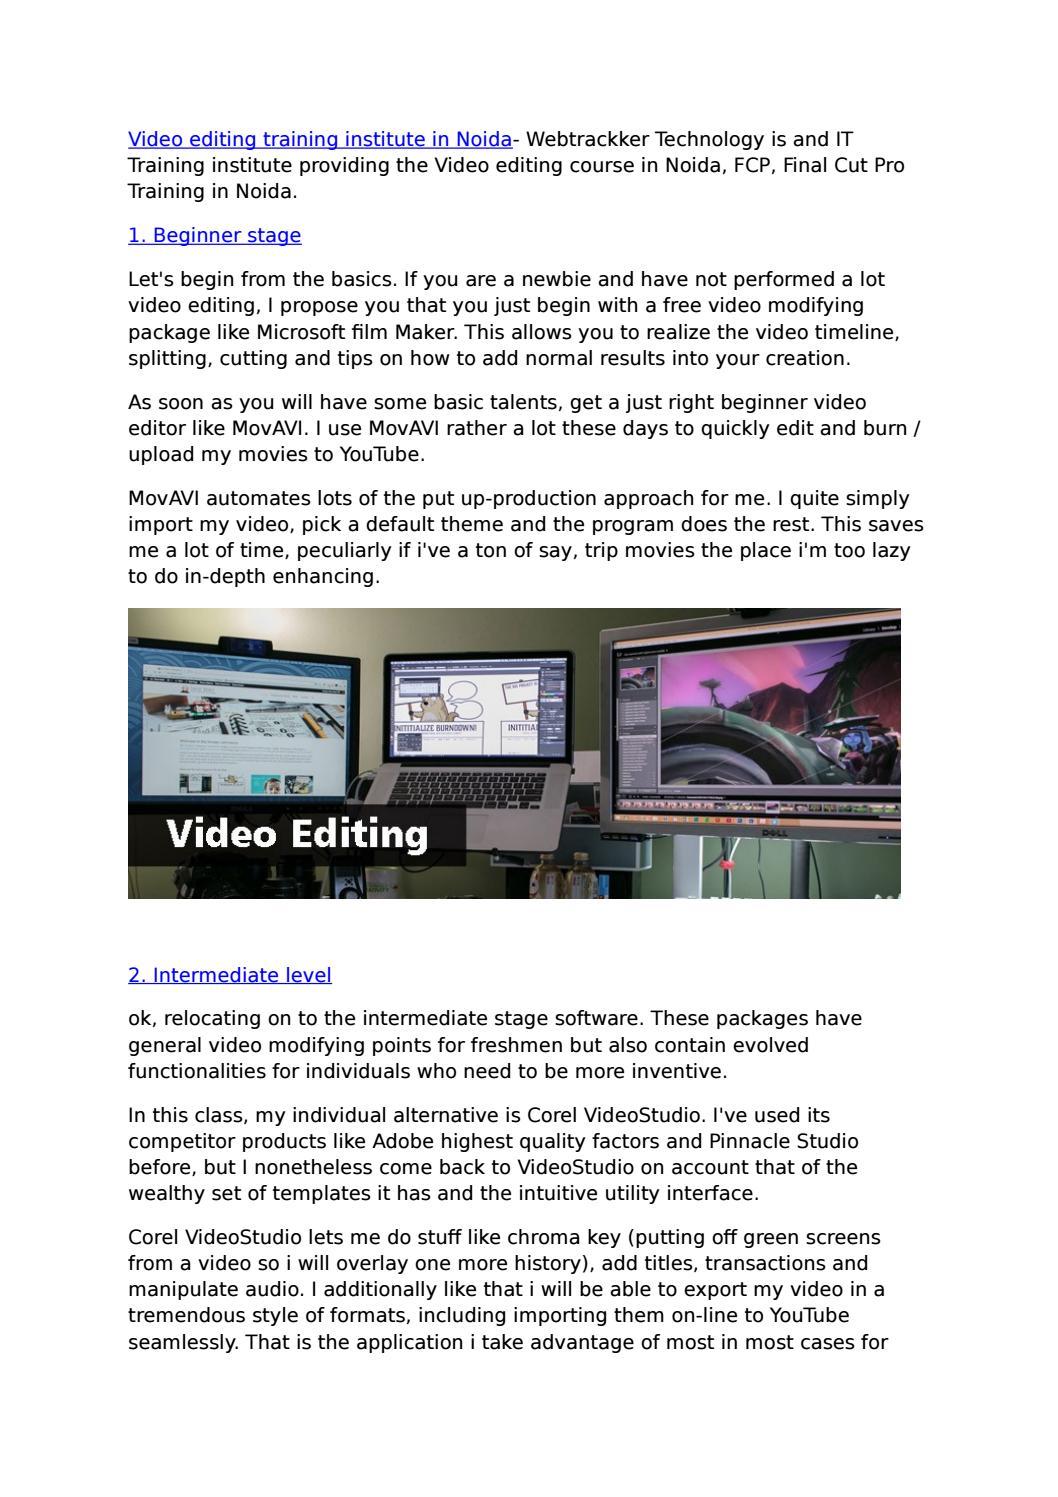 Video editing training institute in Noida by prem yadav - issuu